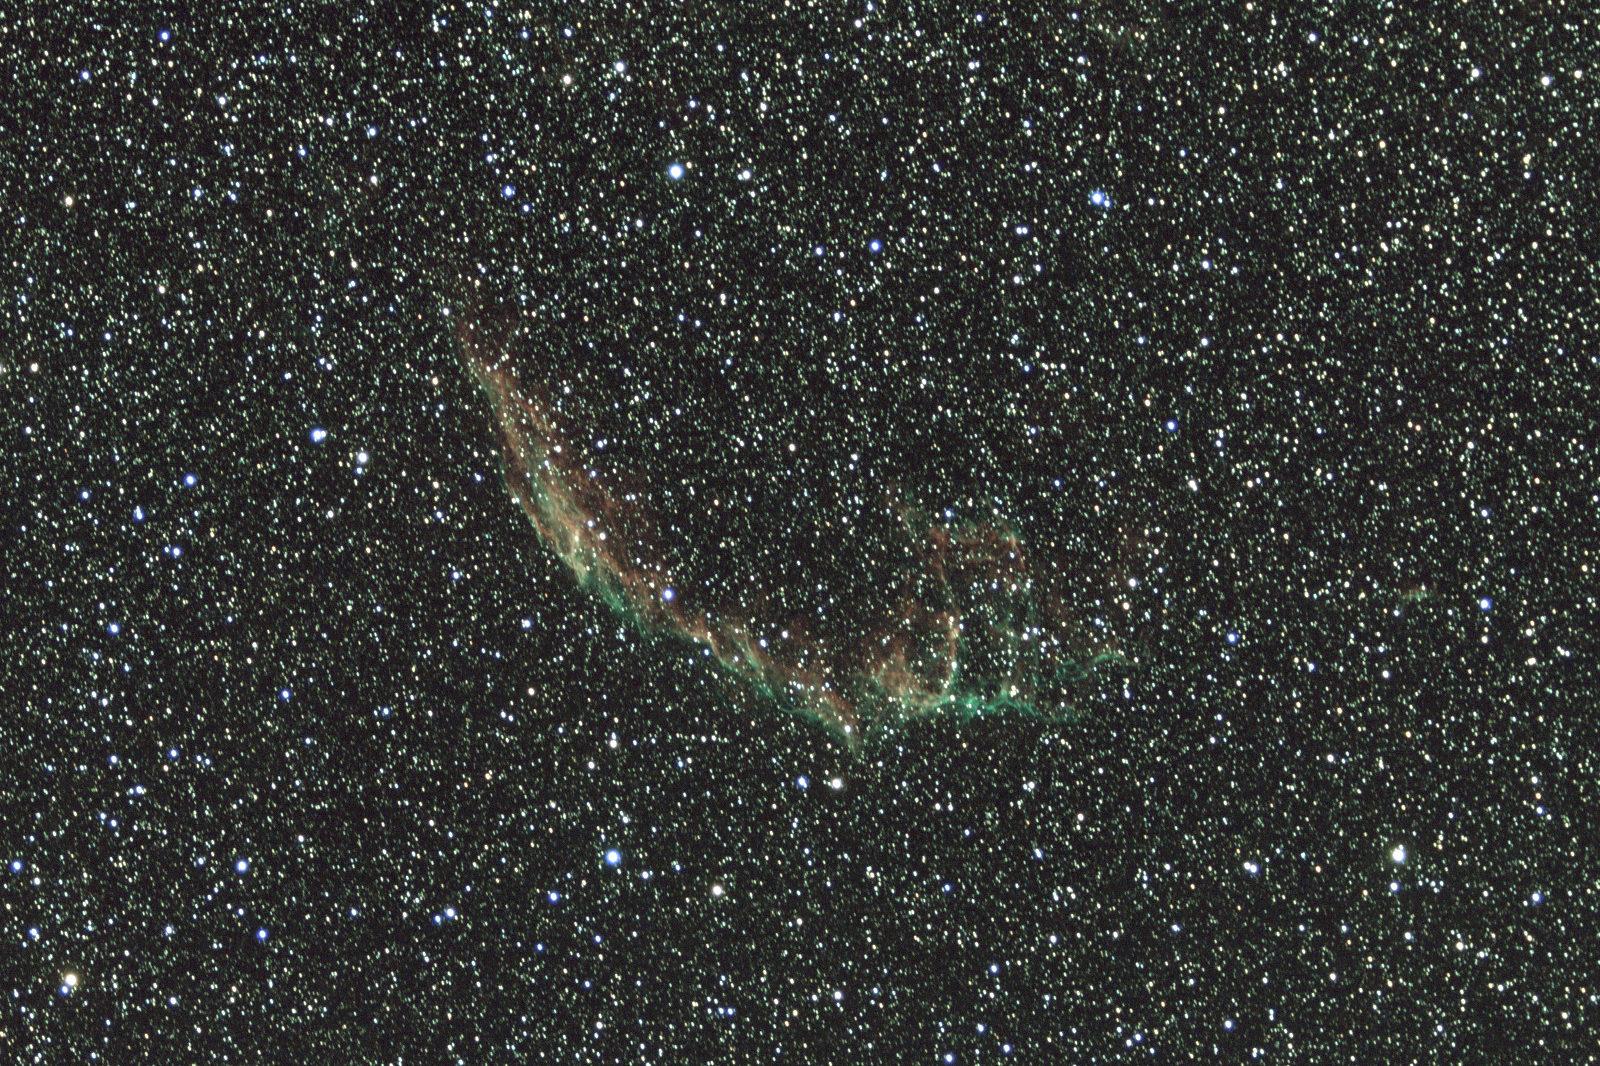 Part of Veil Nebula